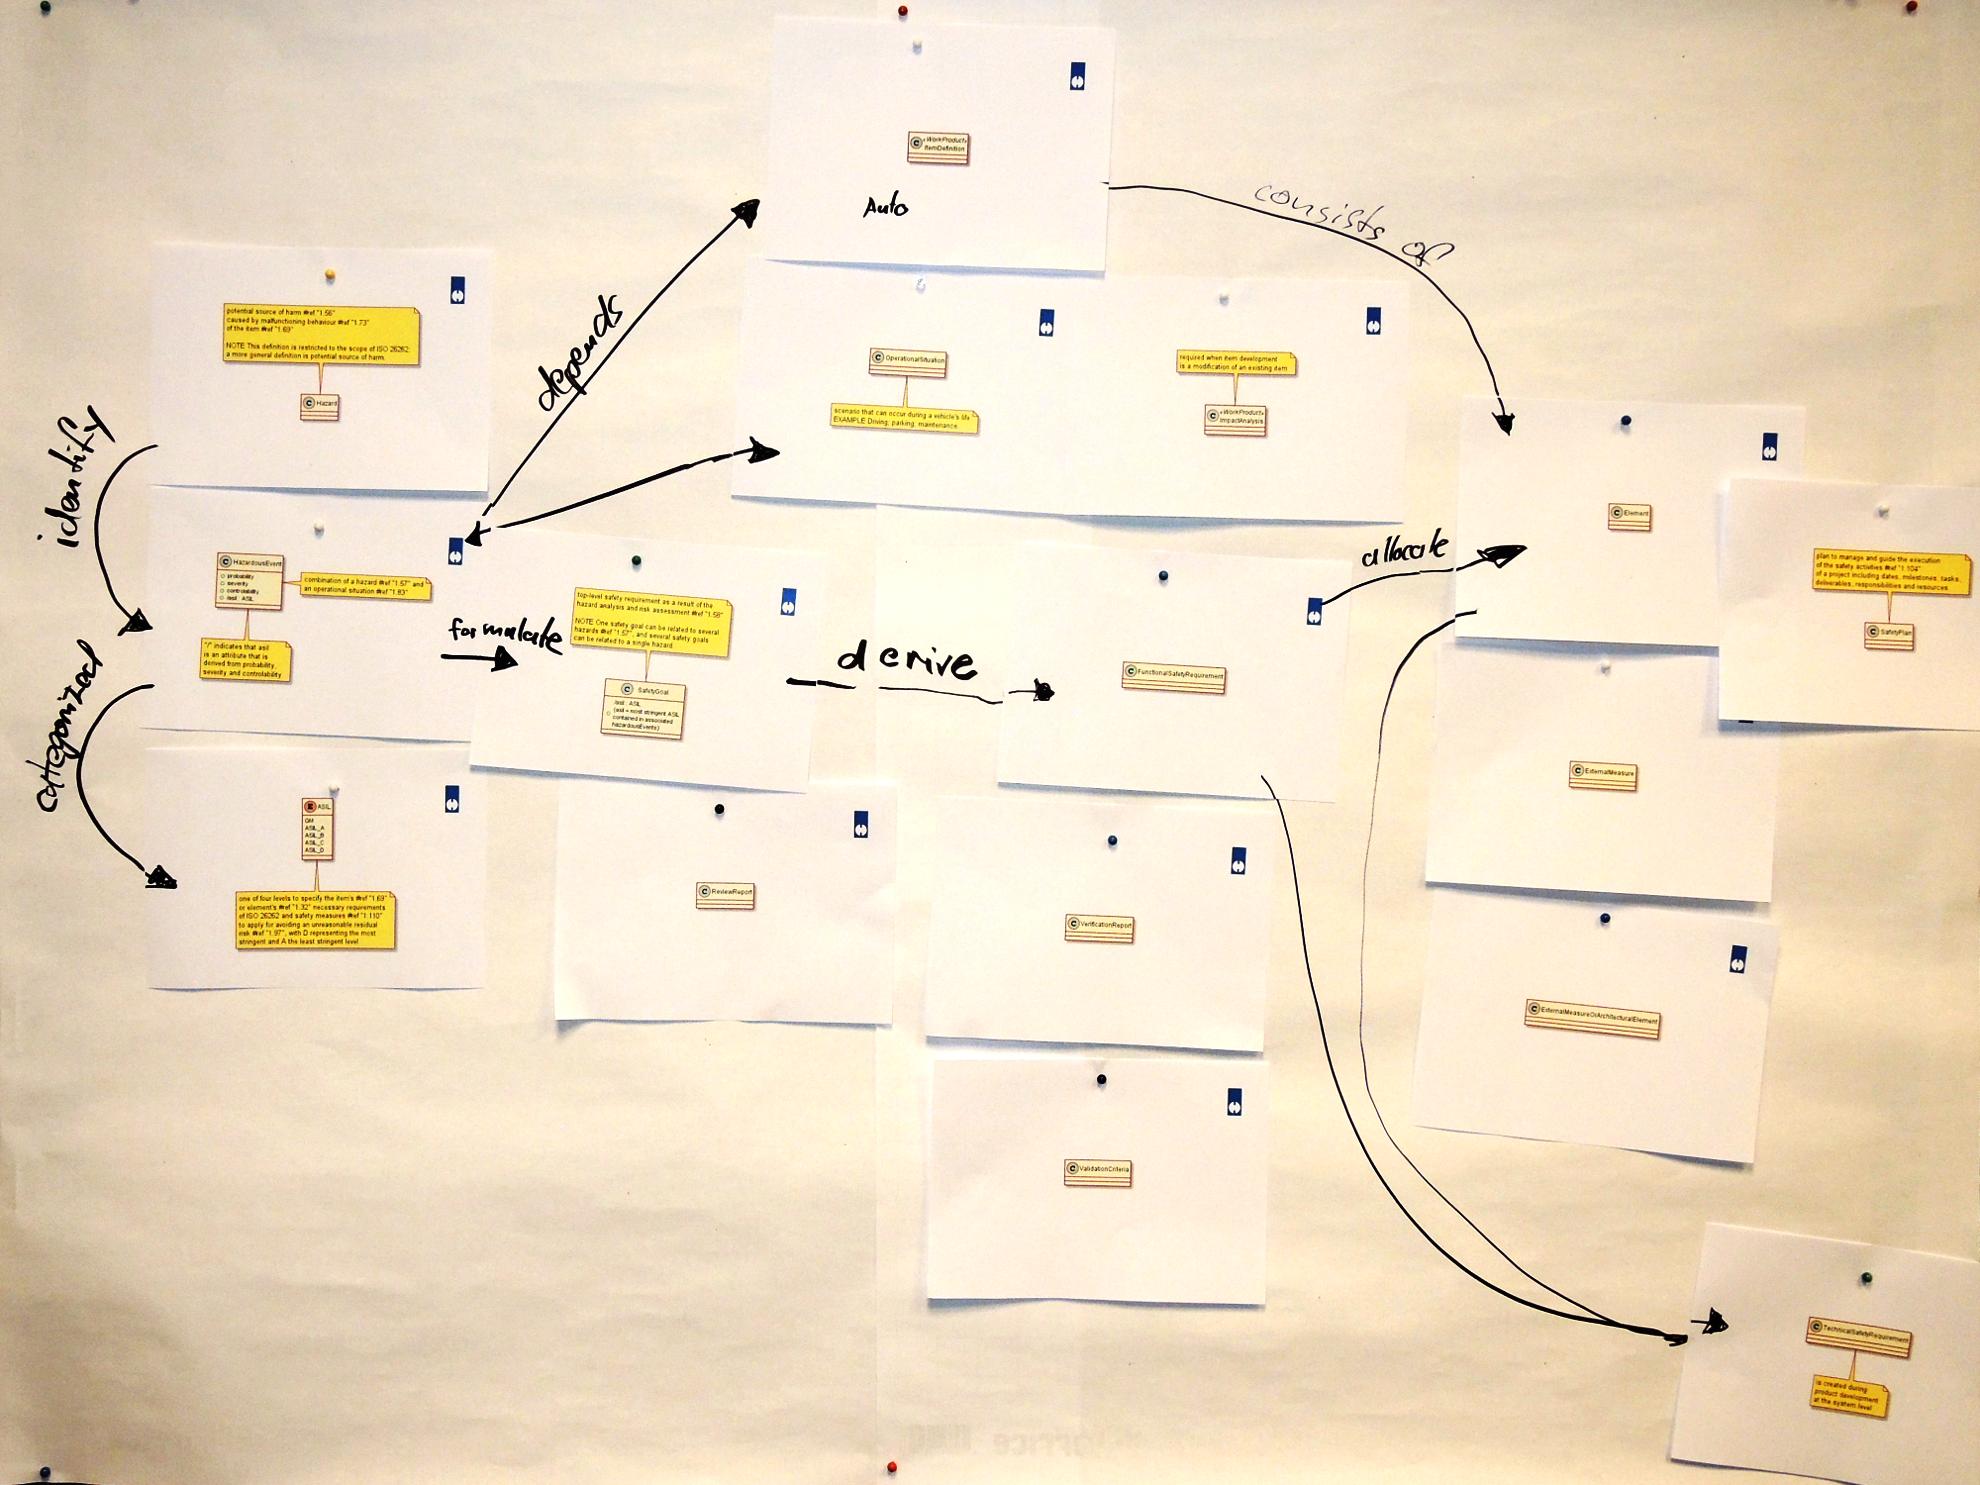 Teilnehmerergebnis: Artefaktemodell der Konzeptphase